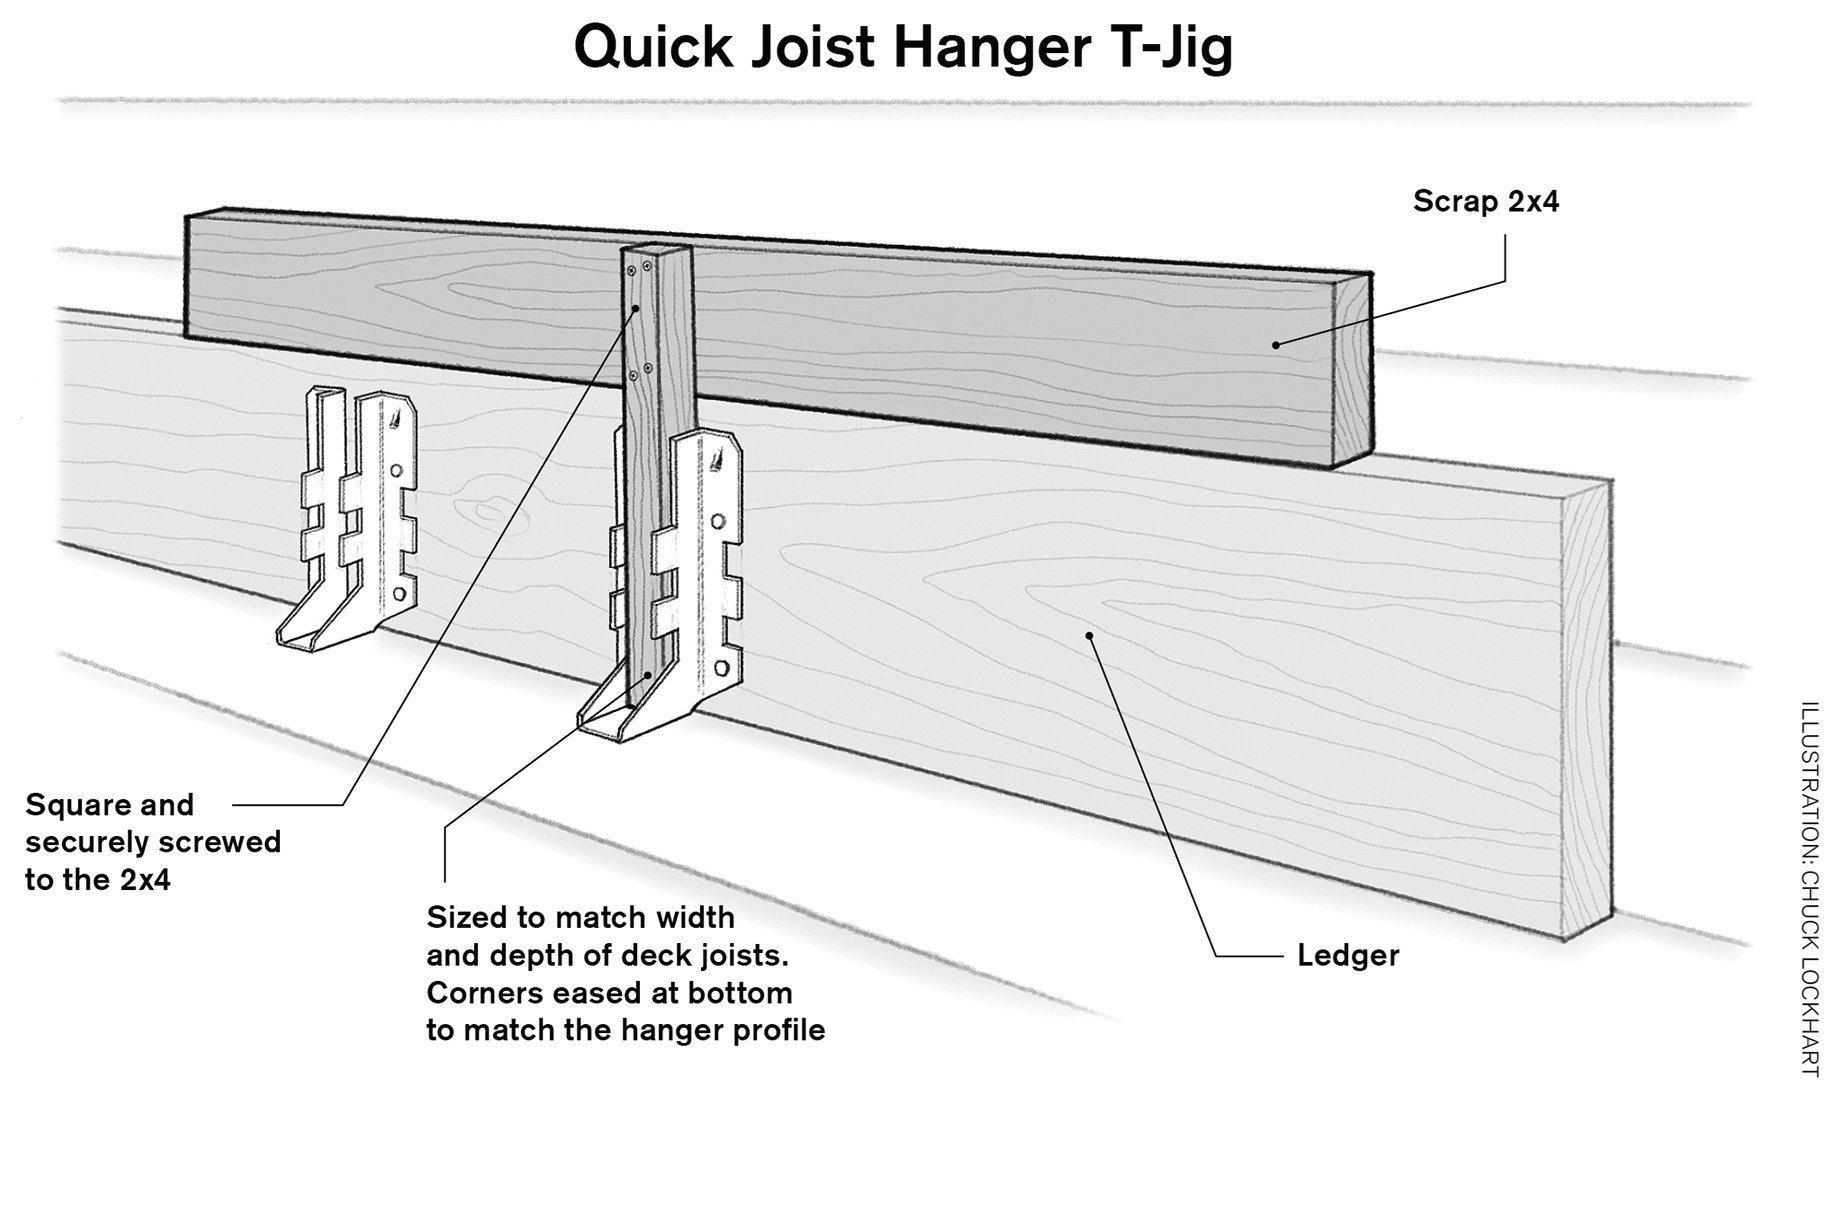 Fast Joist Hanger Installation Jlc Online